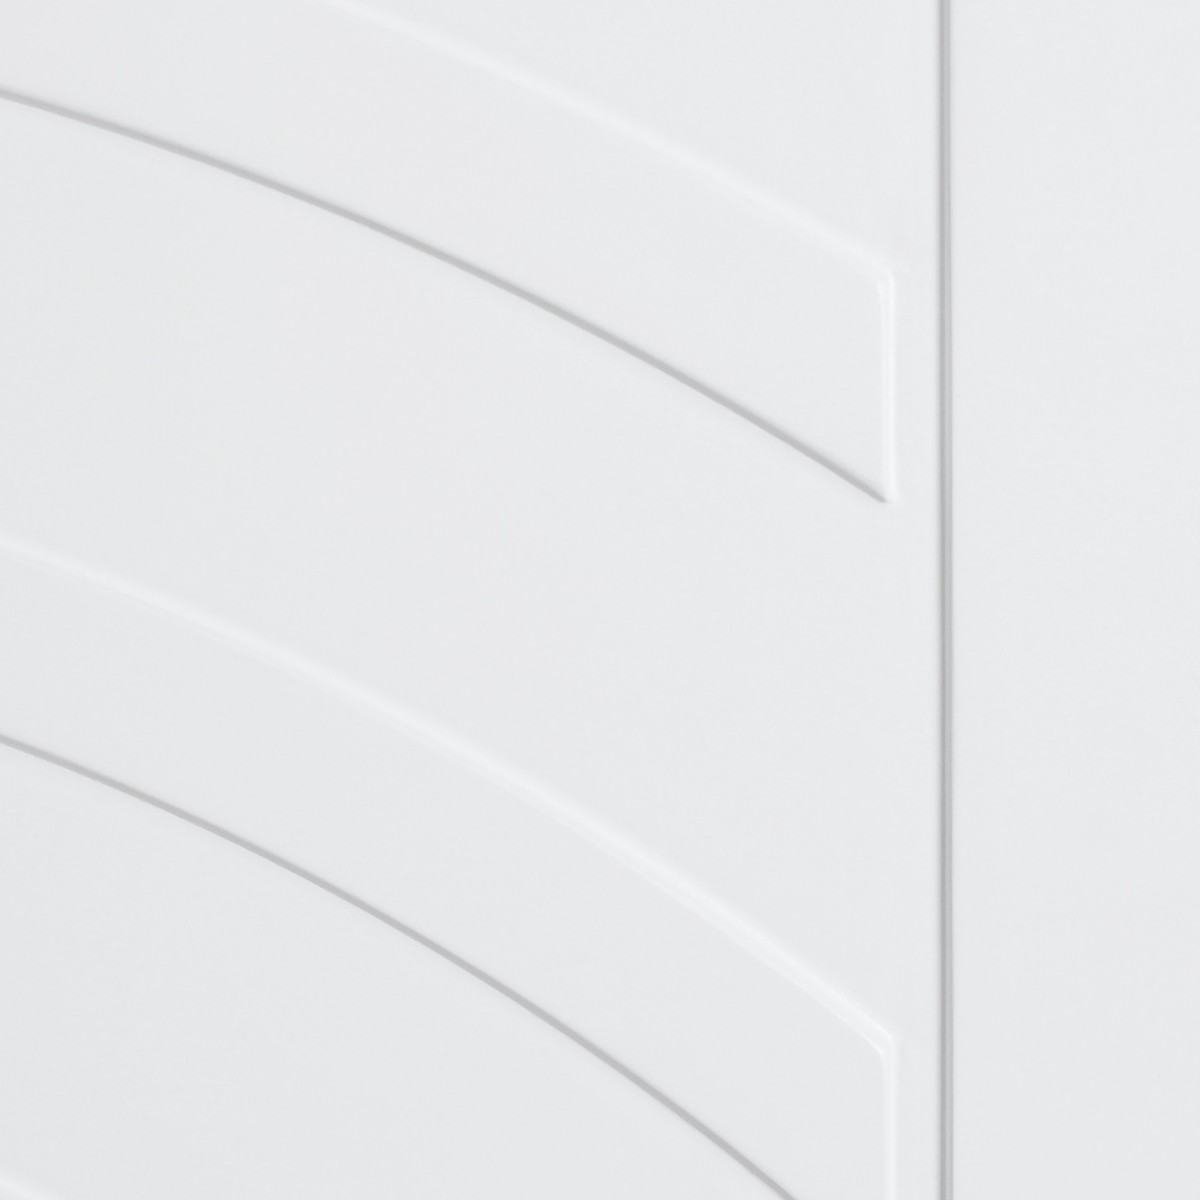 Дверь Межкомнатная Глухая Галактика 60x200 Цвет Белый